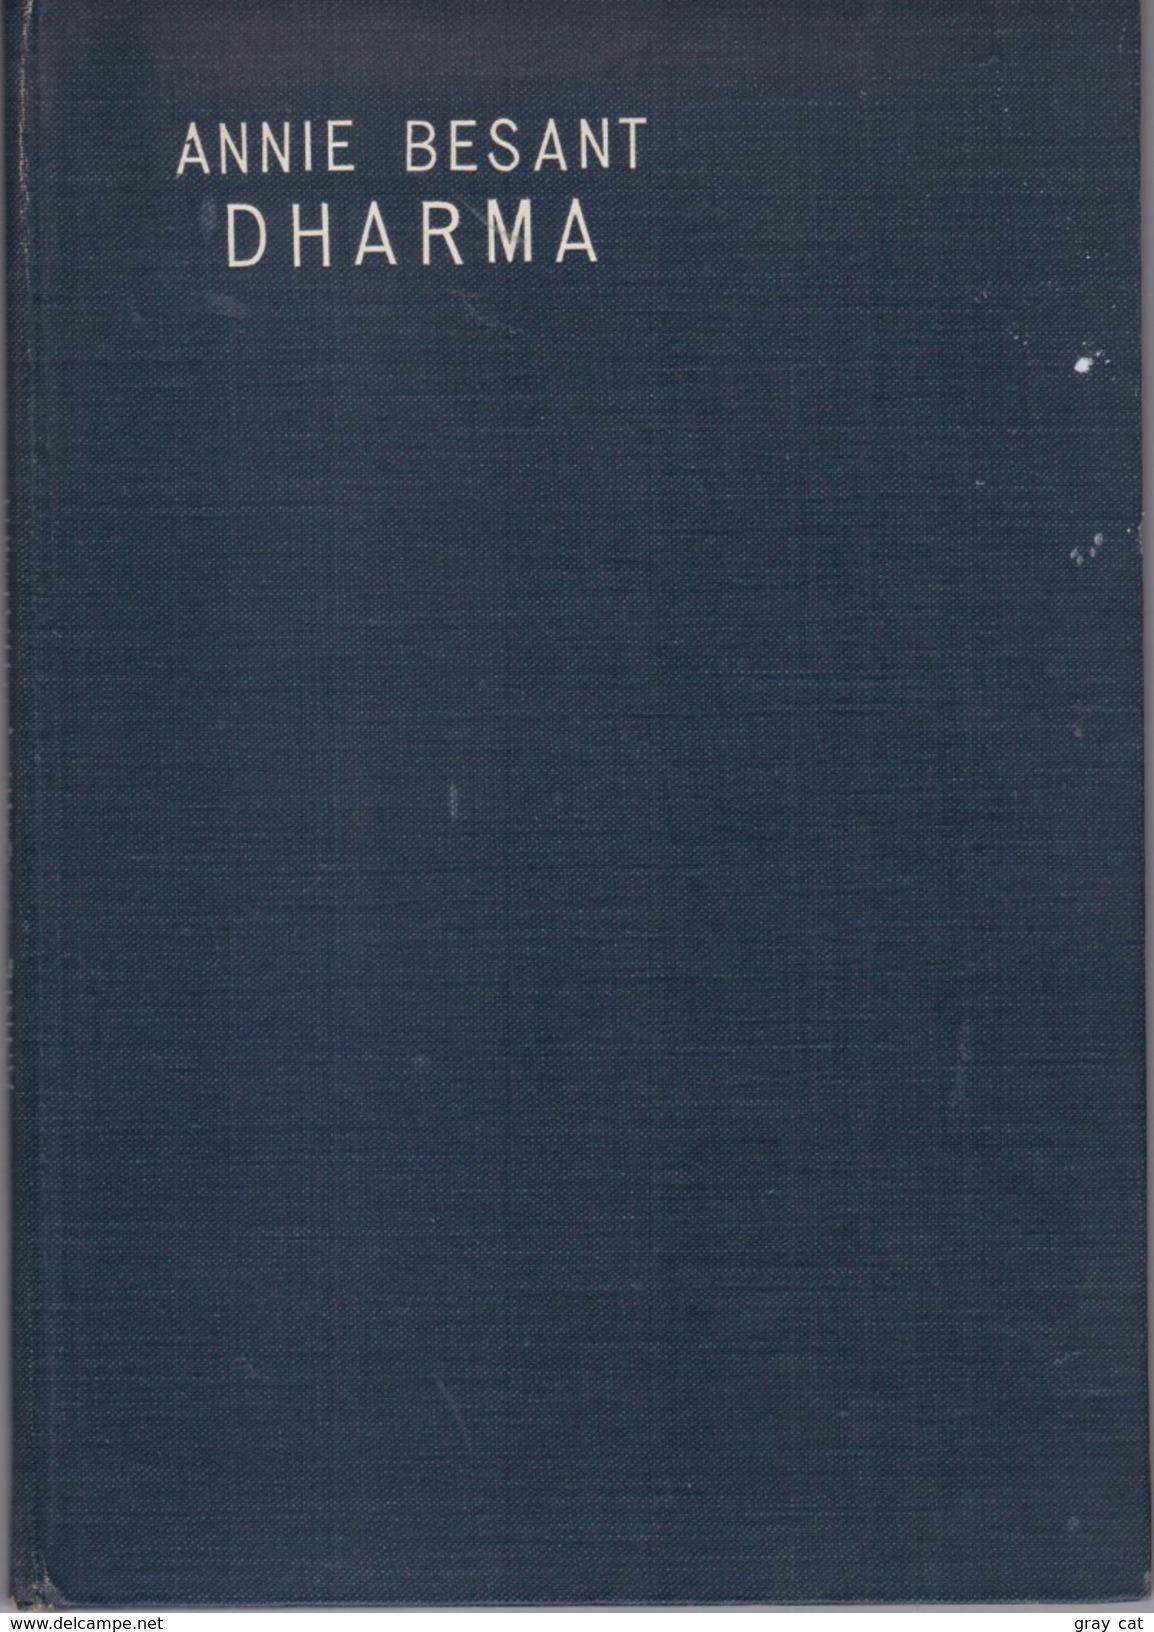 DHARMA By Besant, Annie - Books, Magazines, Comics